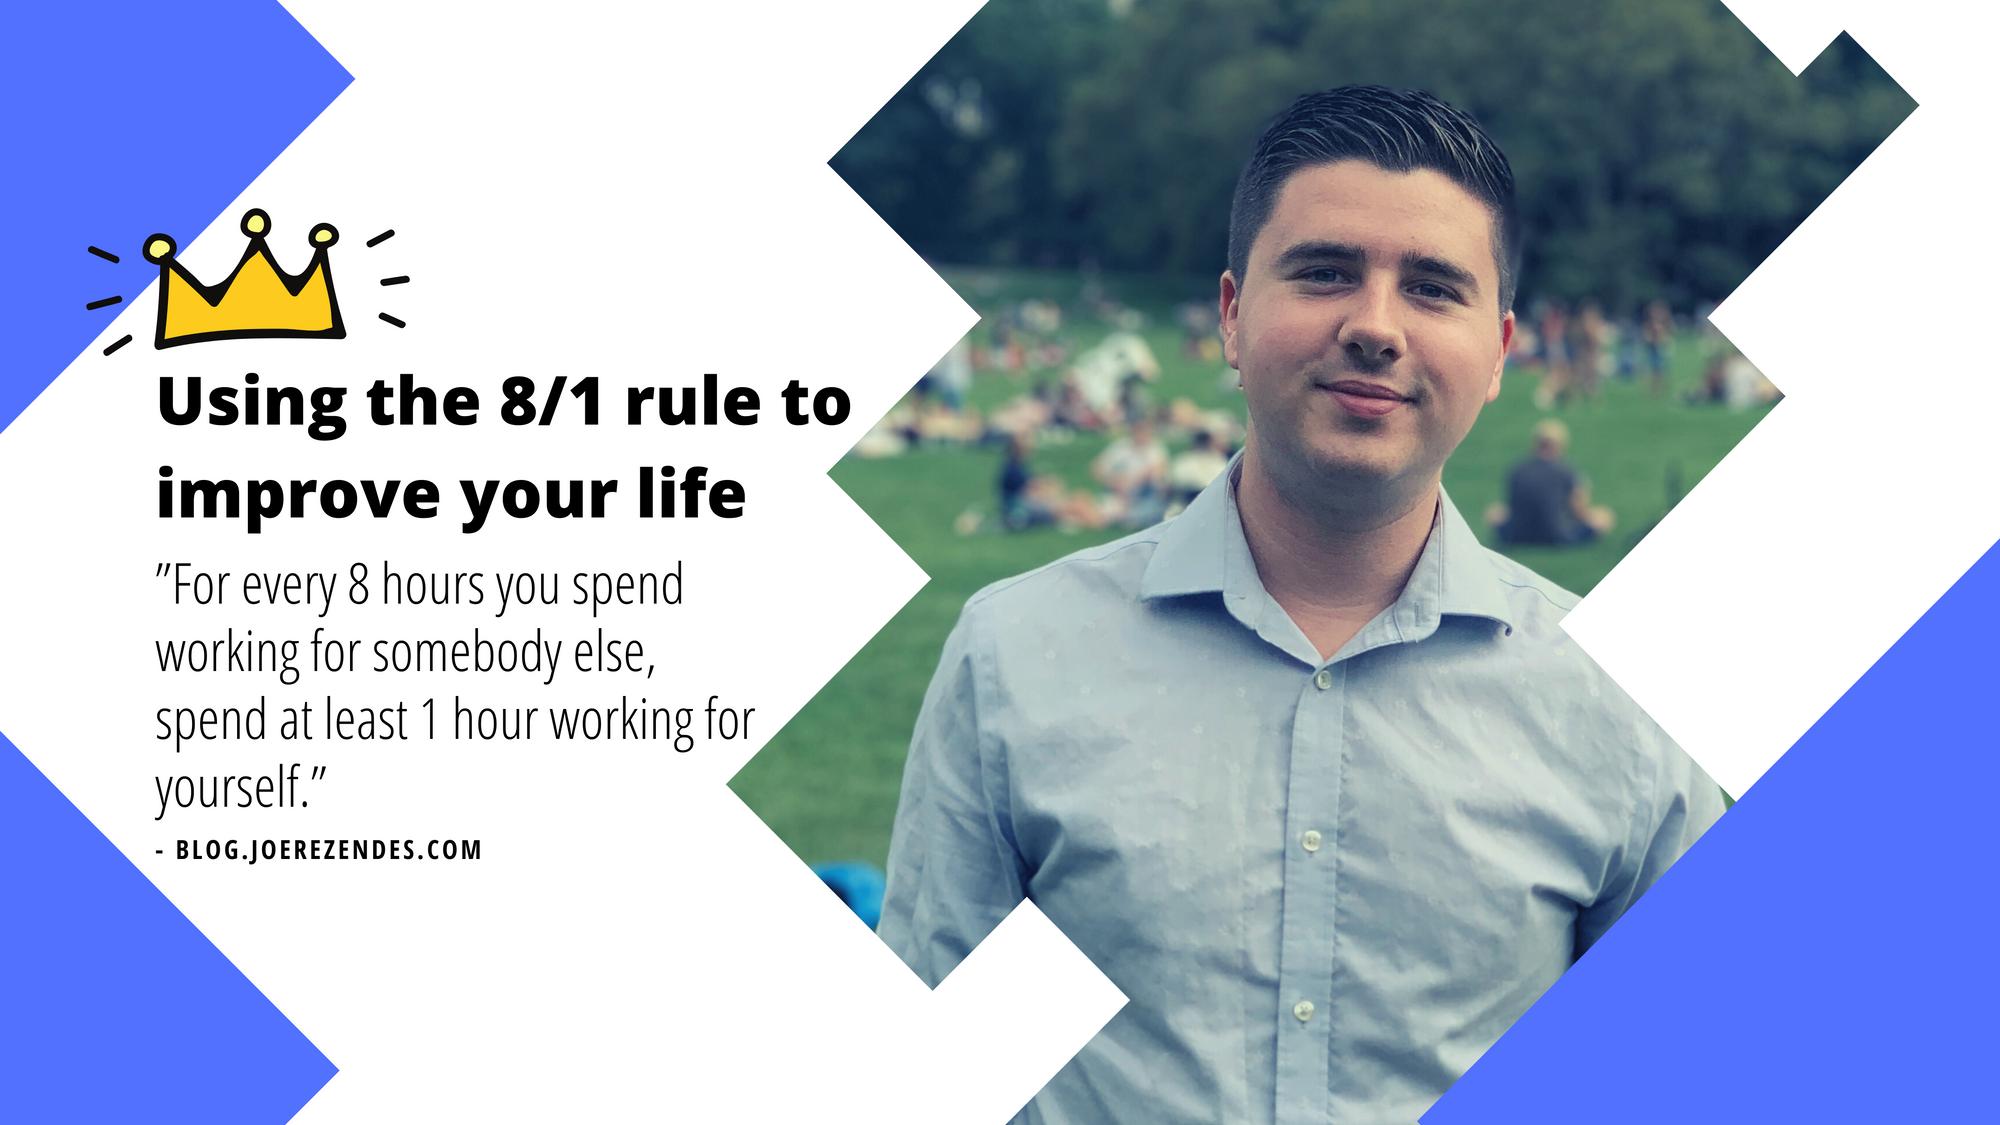 Joe Rezendes - 8/1 rule